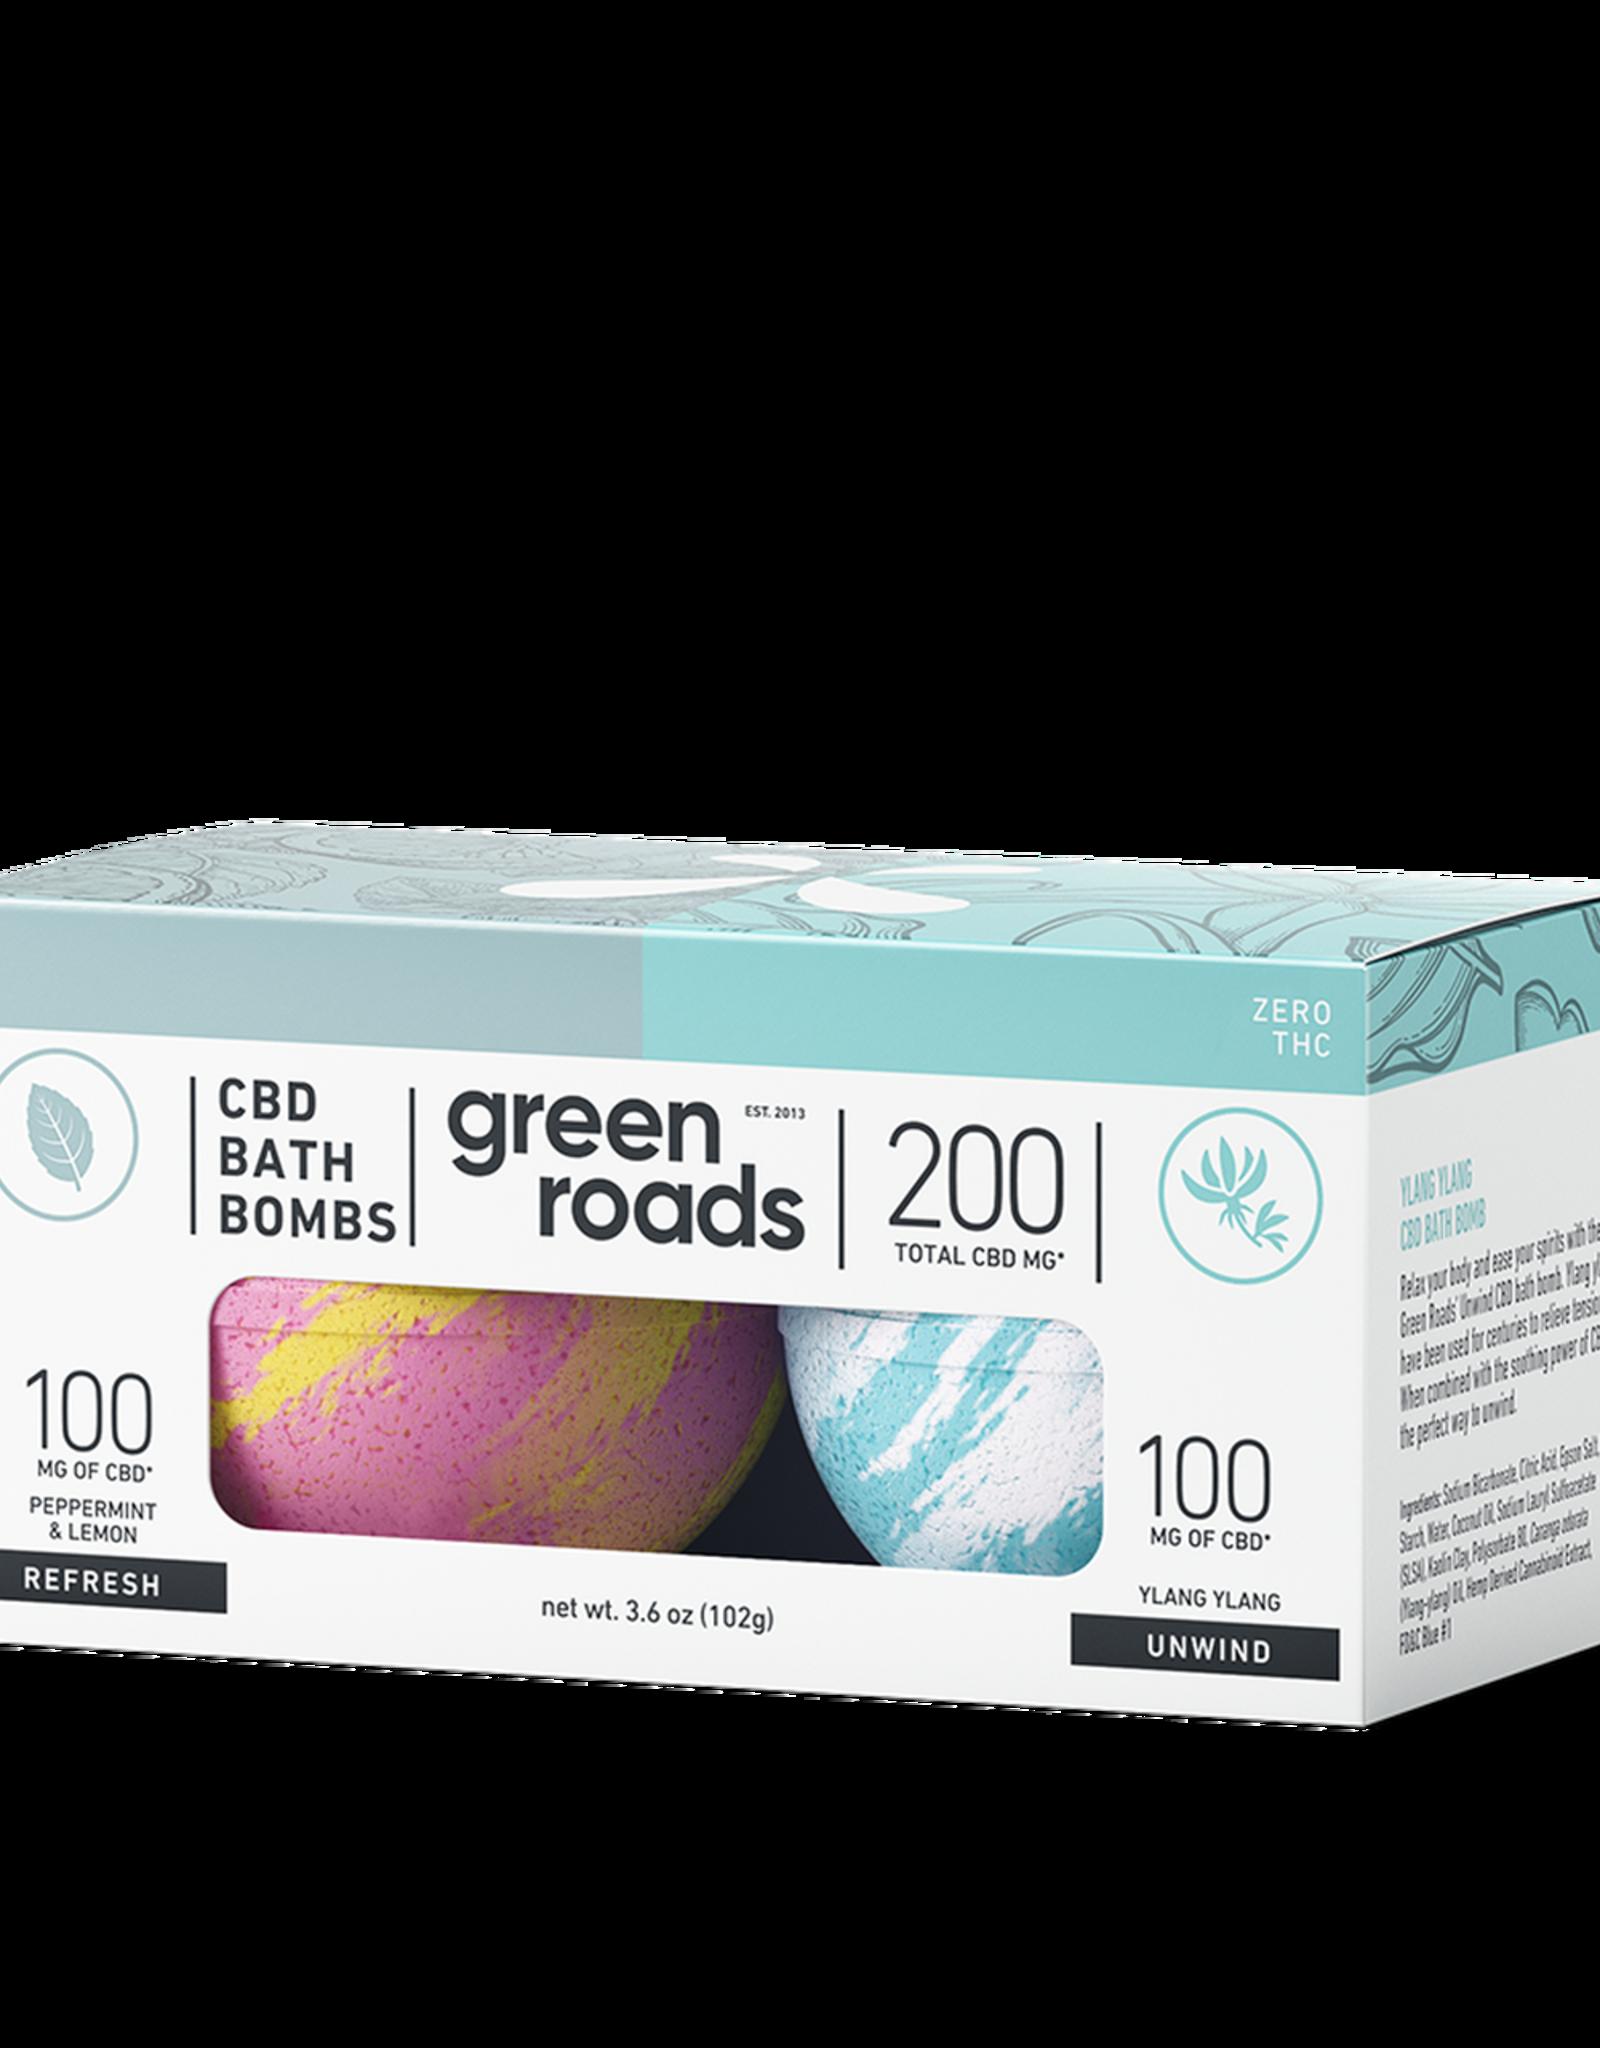 Green Roads Bath Bomb Duo - REFRESH & UNWIND- 200mg